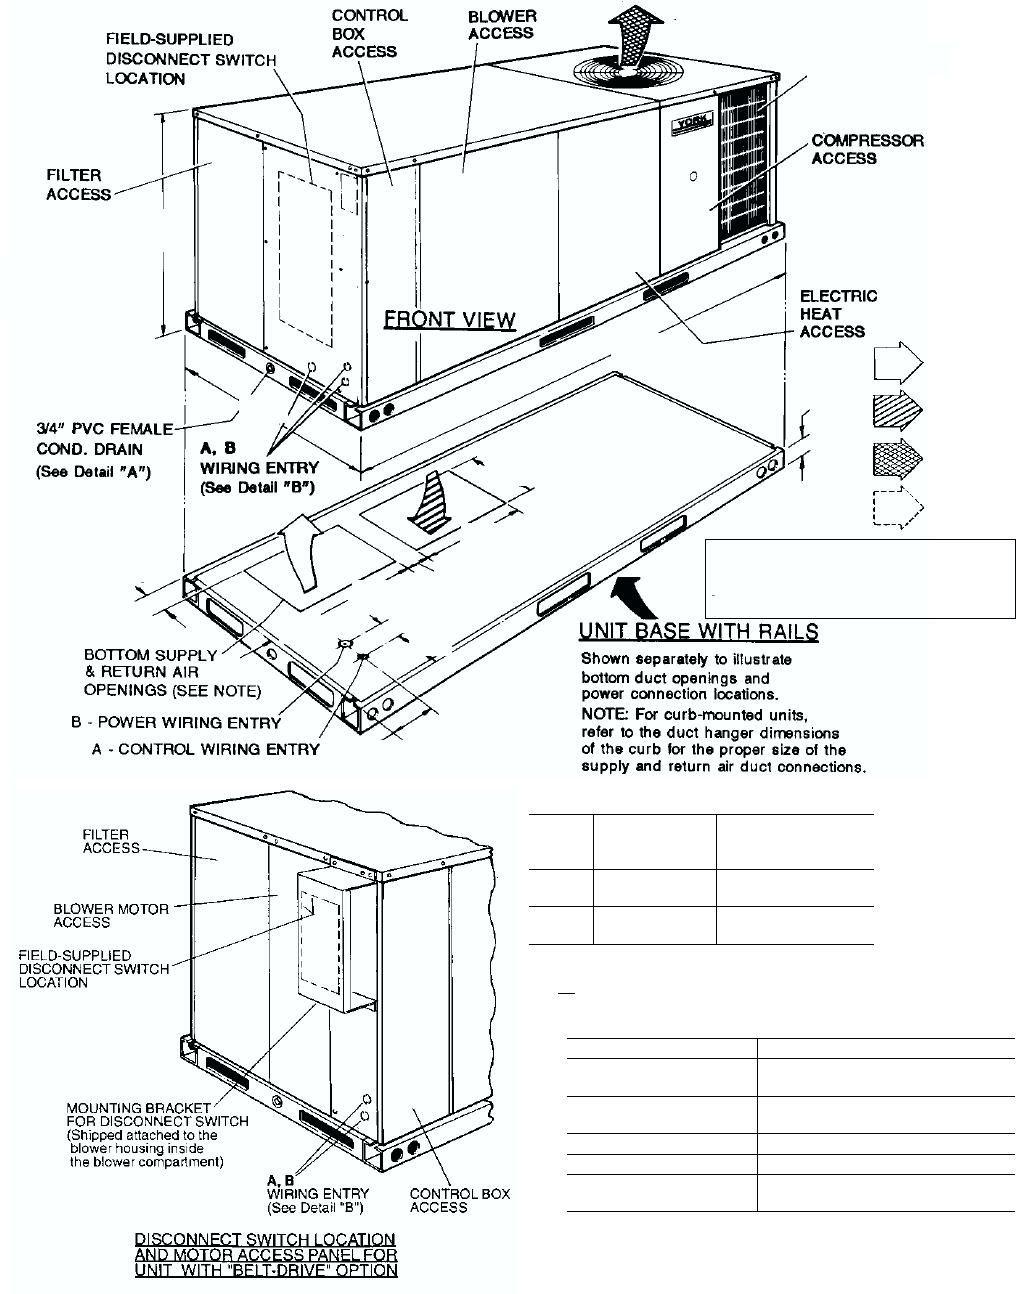 York Heat Pump B3Ch 048 And 060 Users Manual Y IO, Sunline